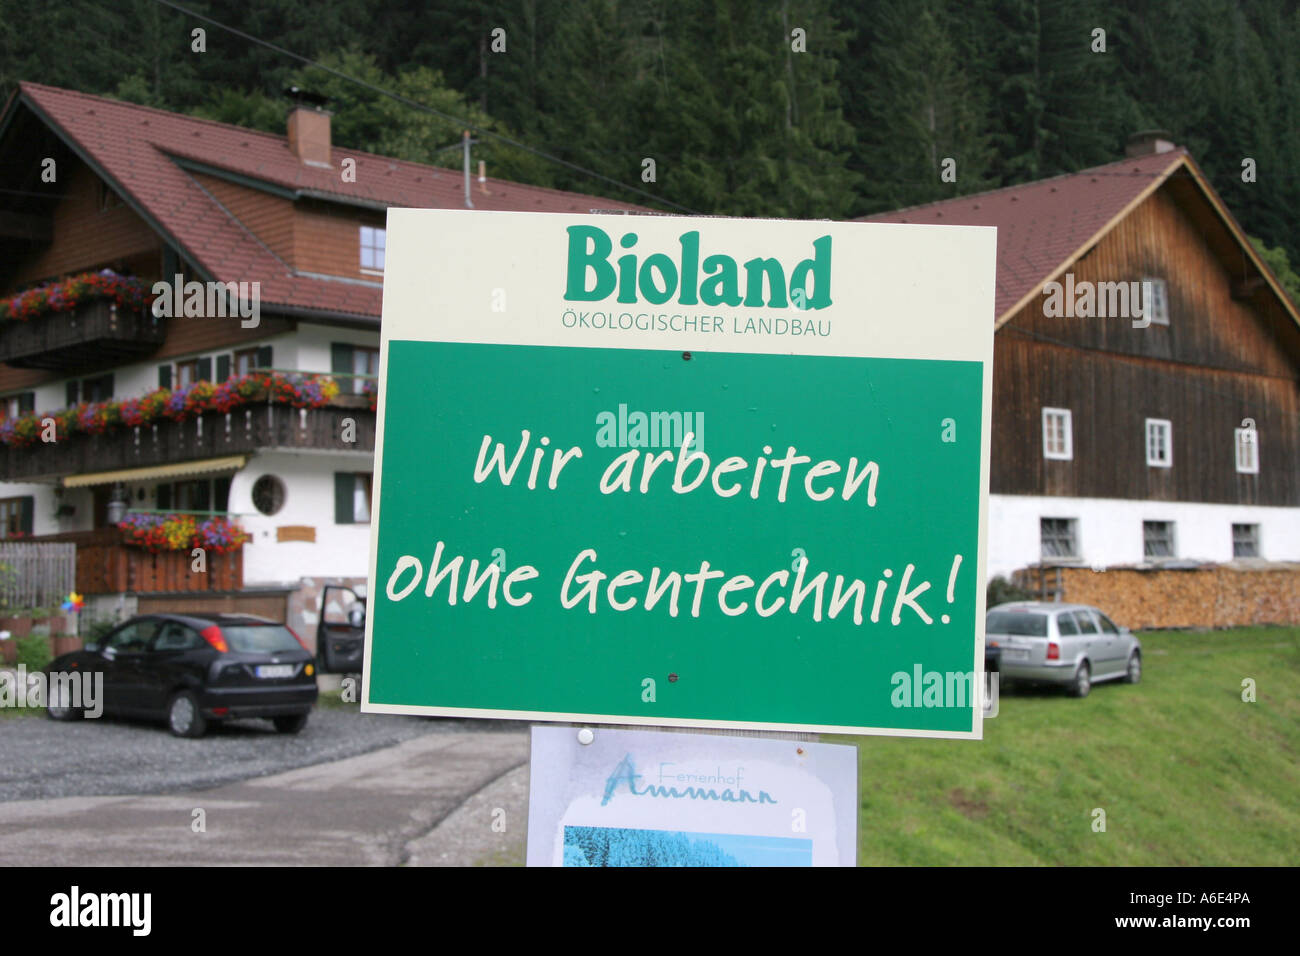 bioland stock photos & bioland stock images - alamy